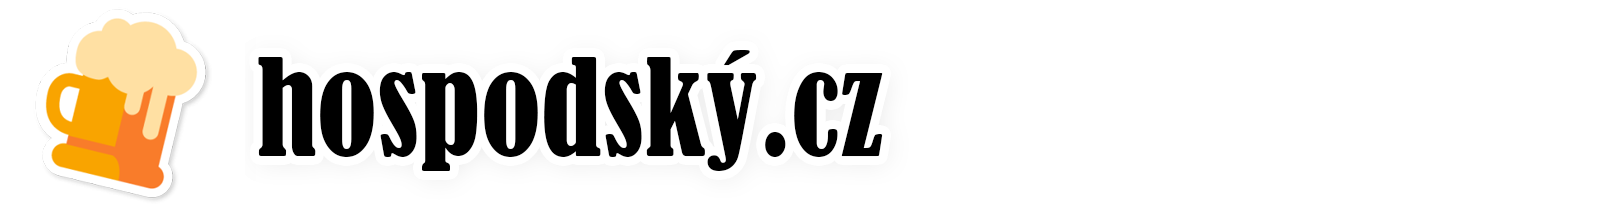 hospodsky-logo